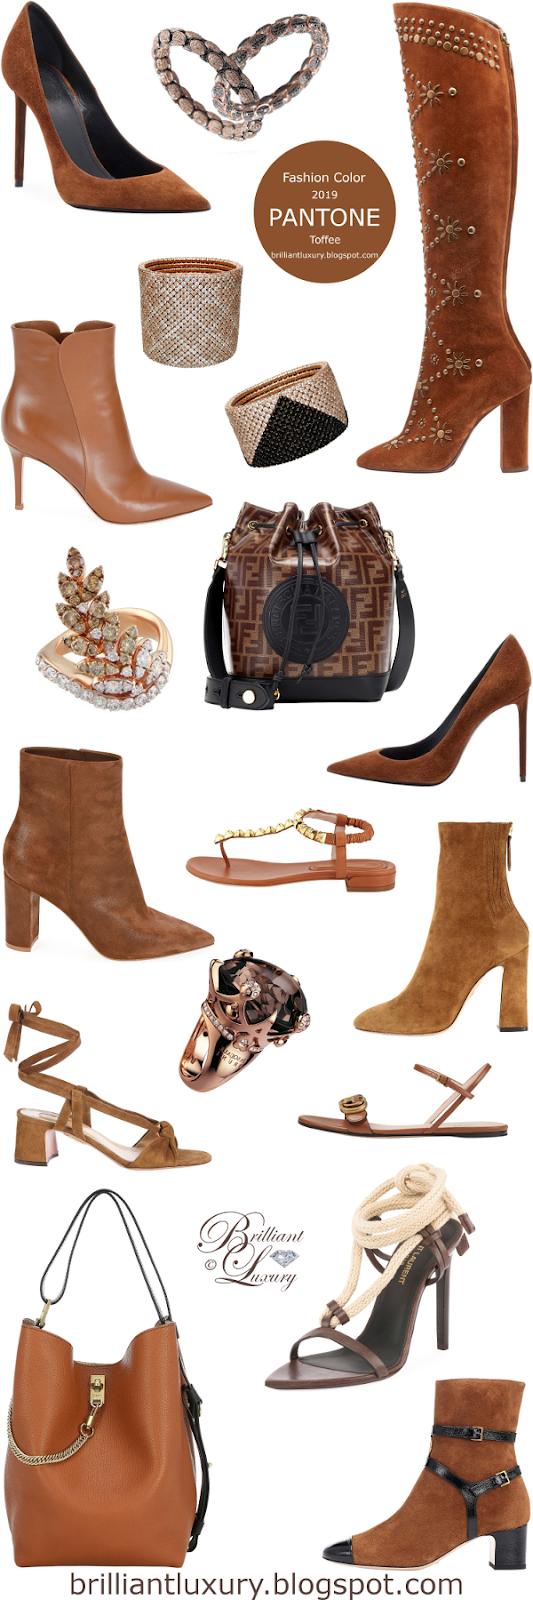 Brilliant Luxury ♦ Pantone Fashion Color ~ Toffee